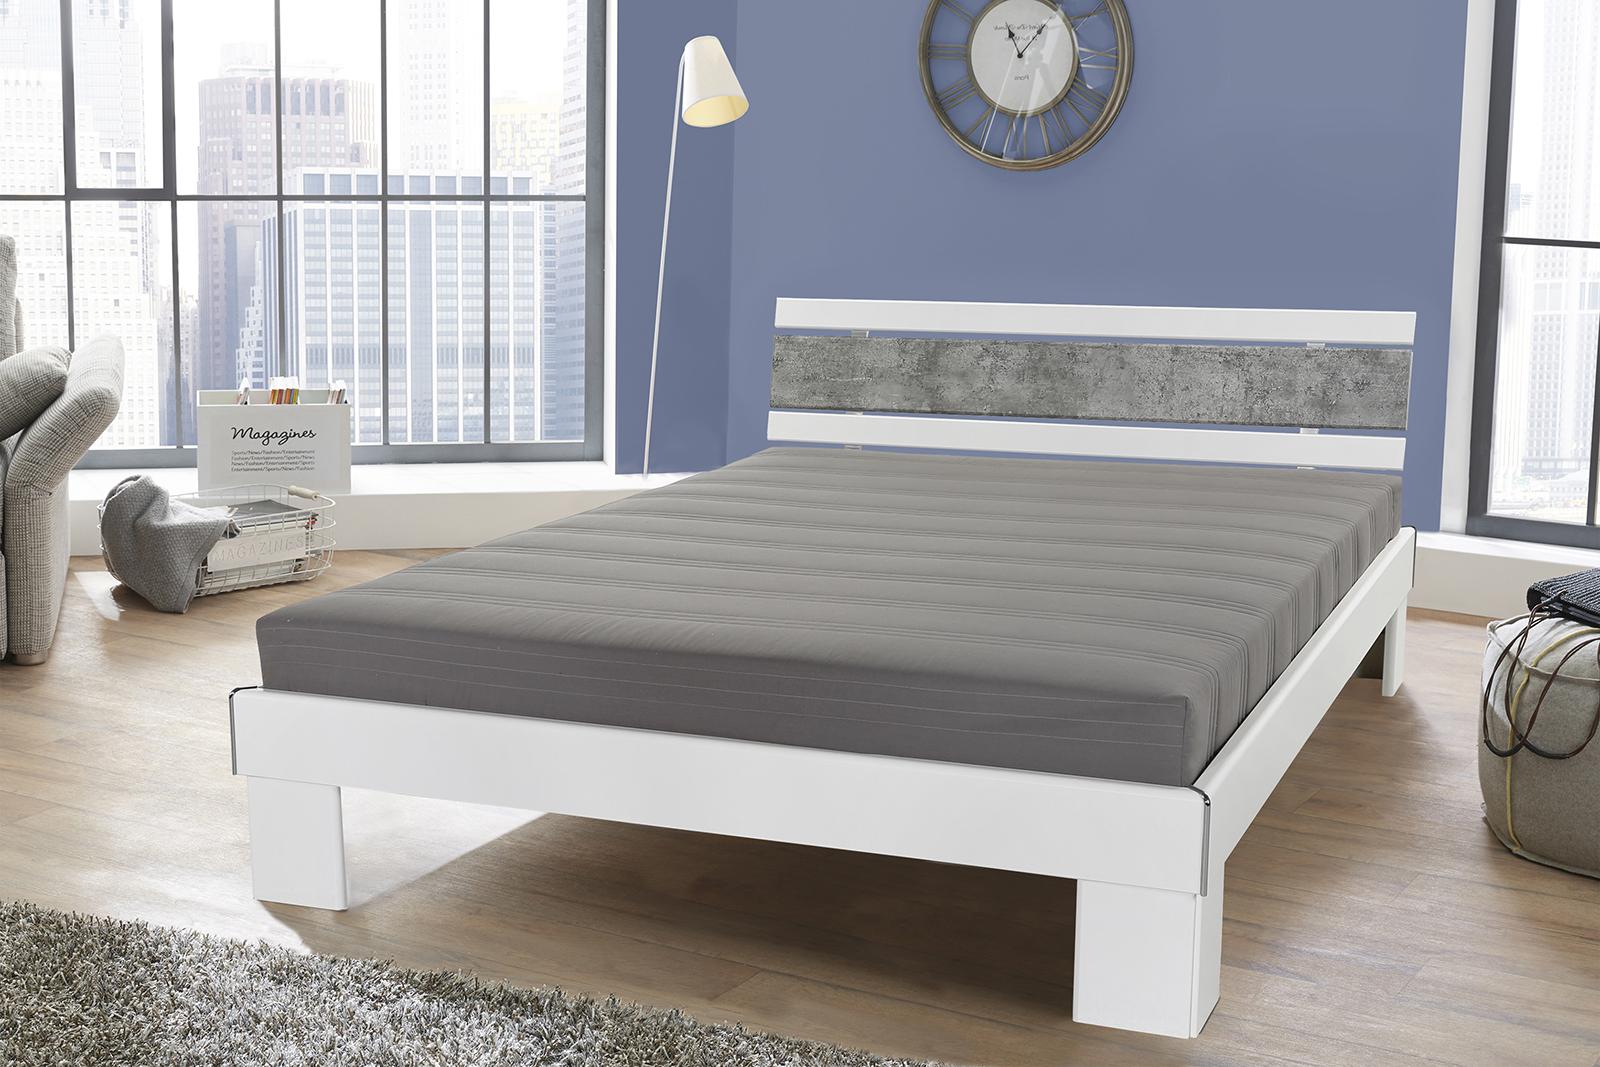 140x200 futonbett rhone inkl rollrost u matratze weiss beton. Black Bedroom Furniture Sets. Home Design Ideas